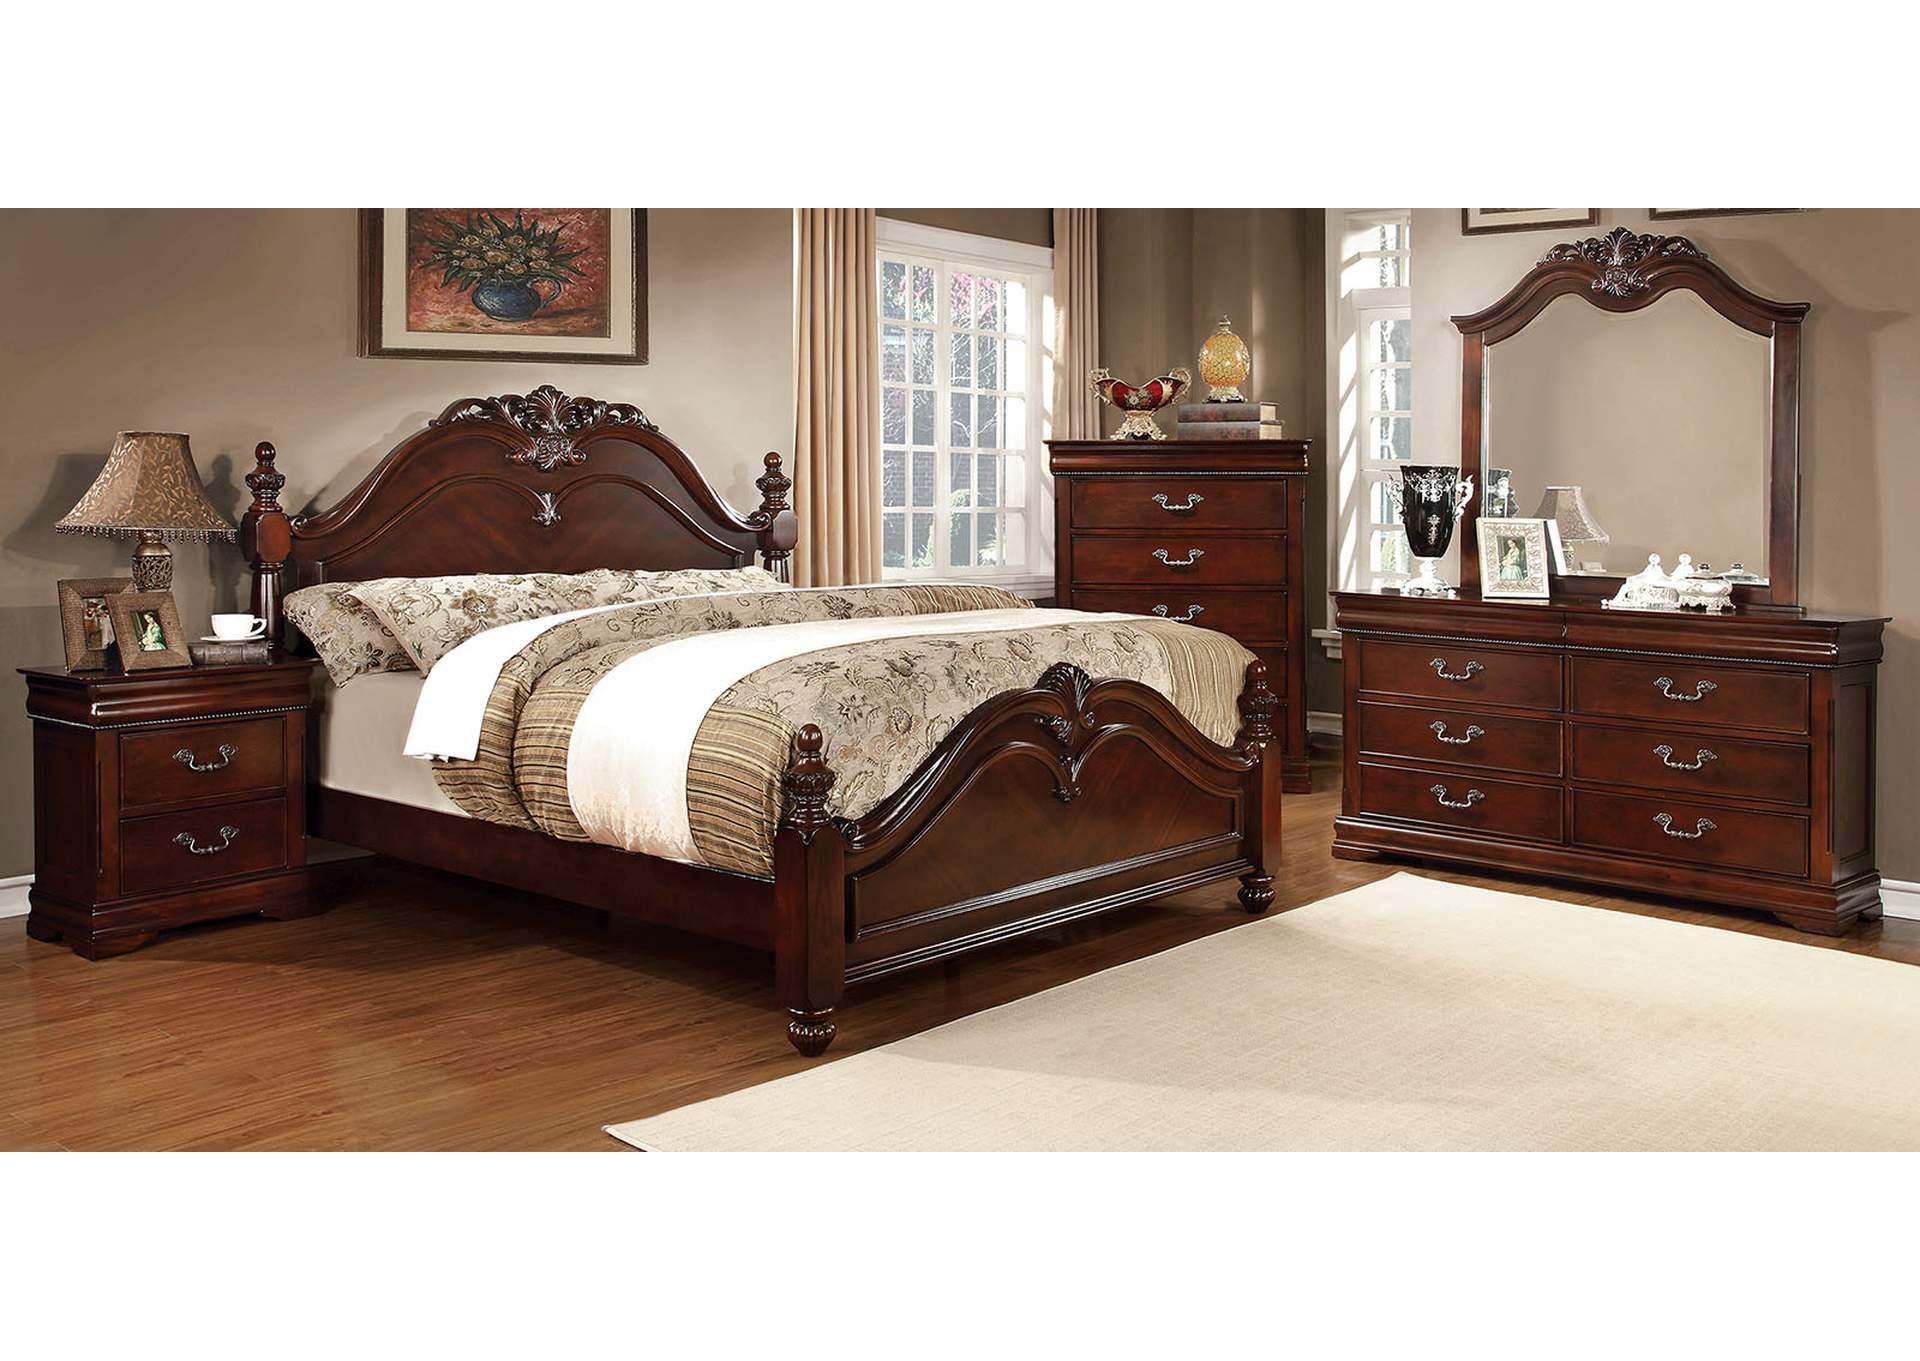 Furniture ville bronx ny mandura cherry lingerie chest w for Furniture ville